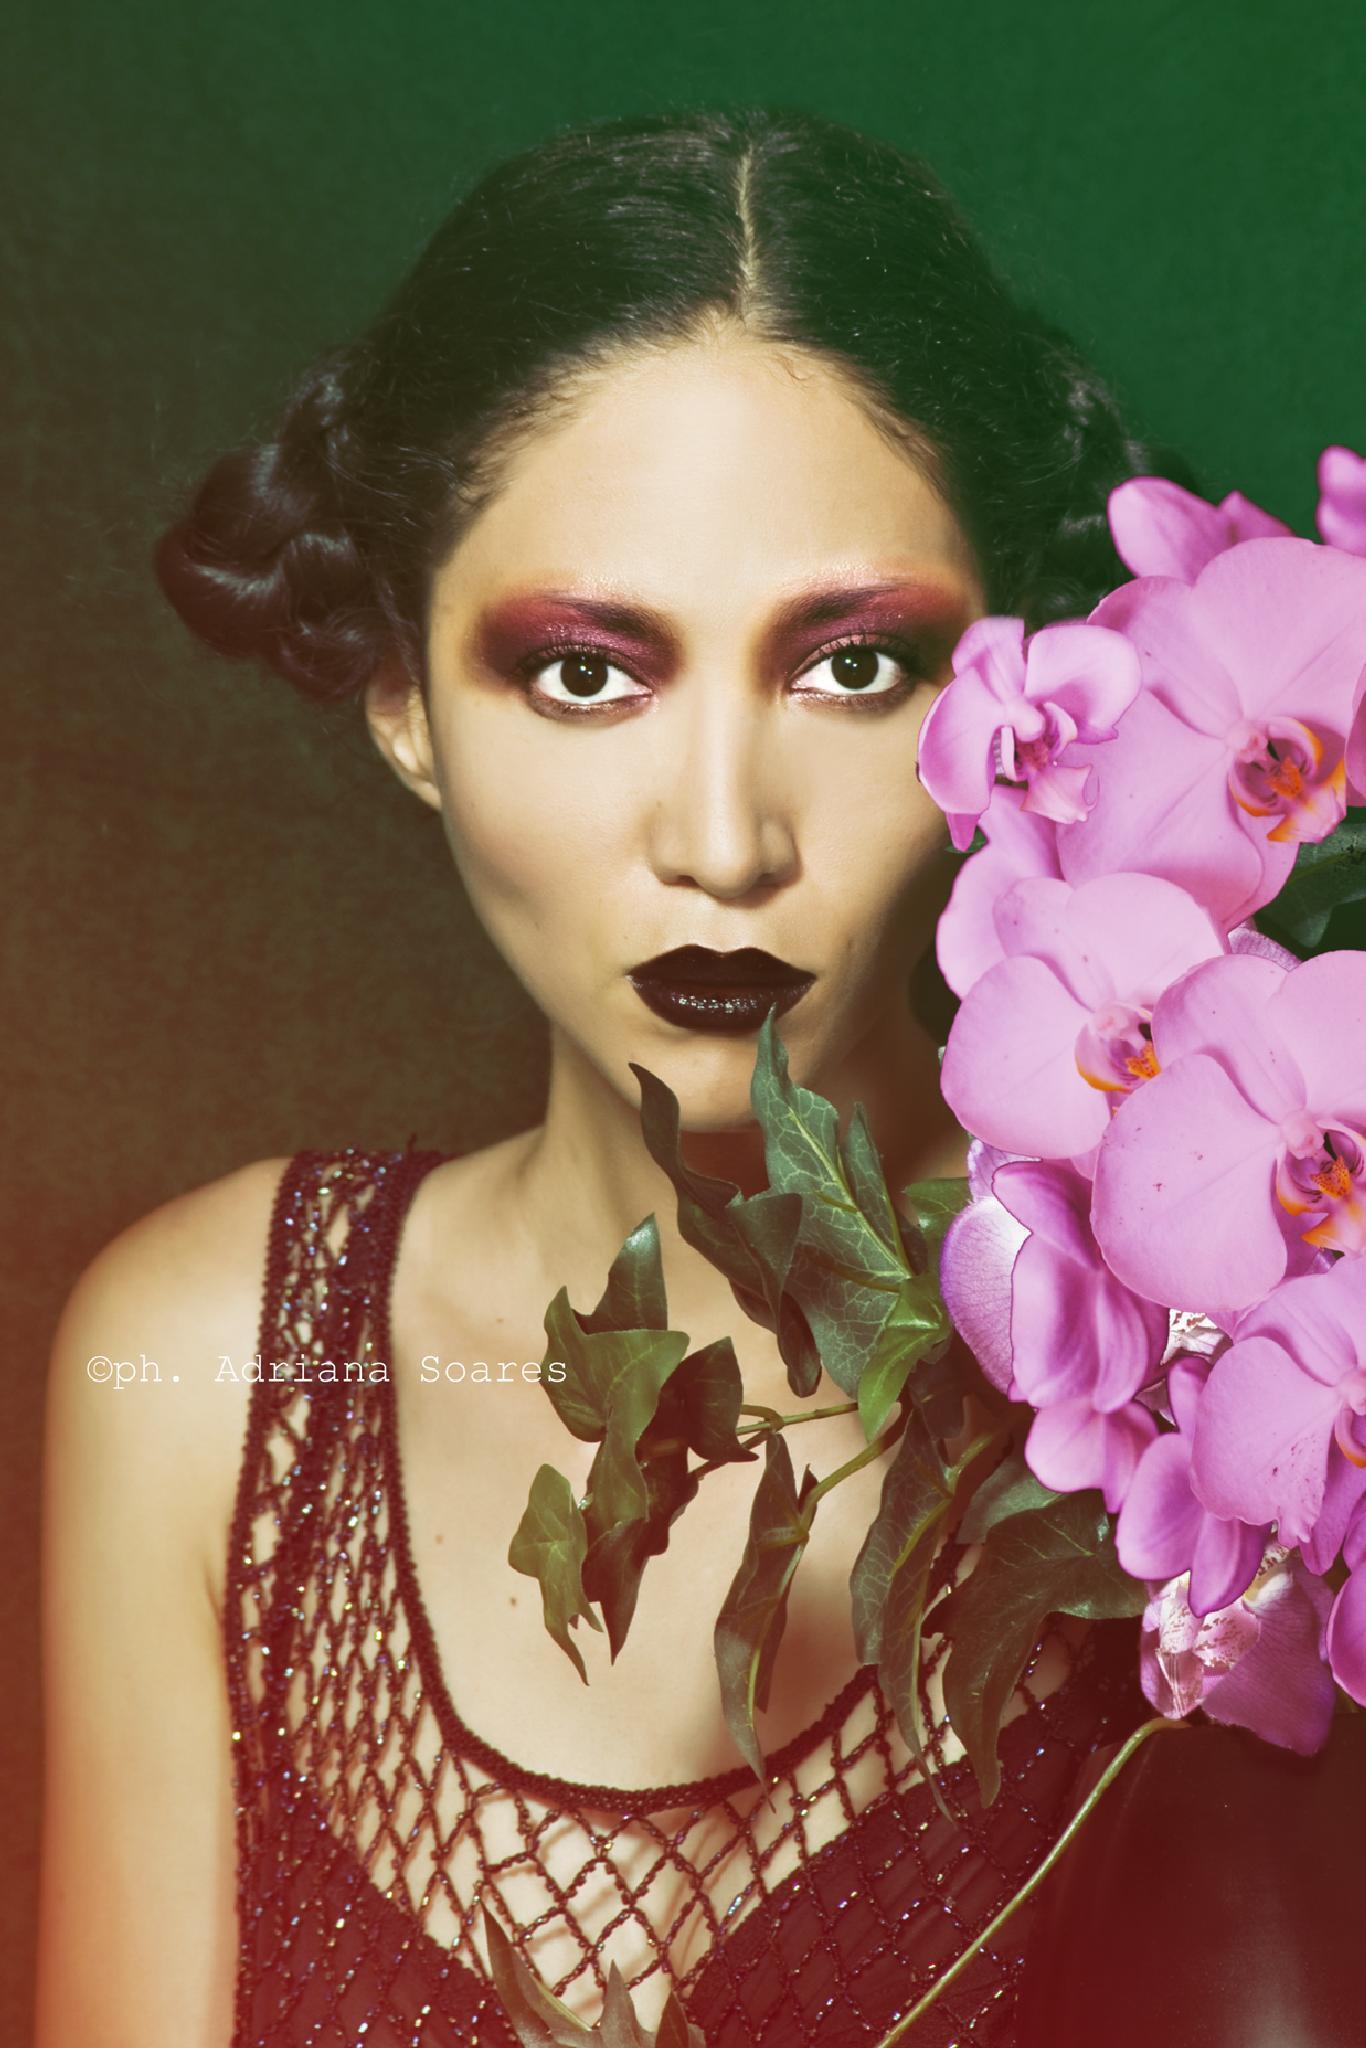 Flowers by adrianasoaresph